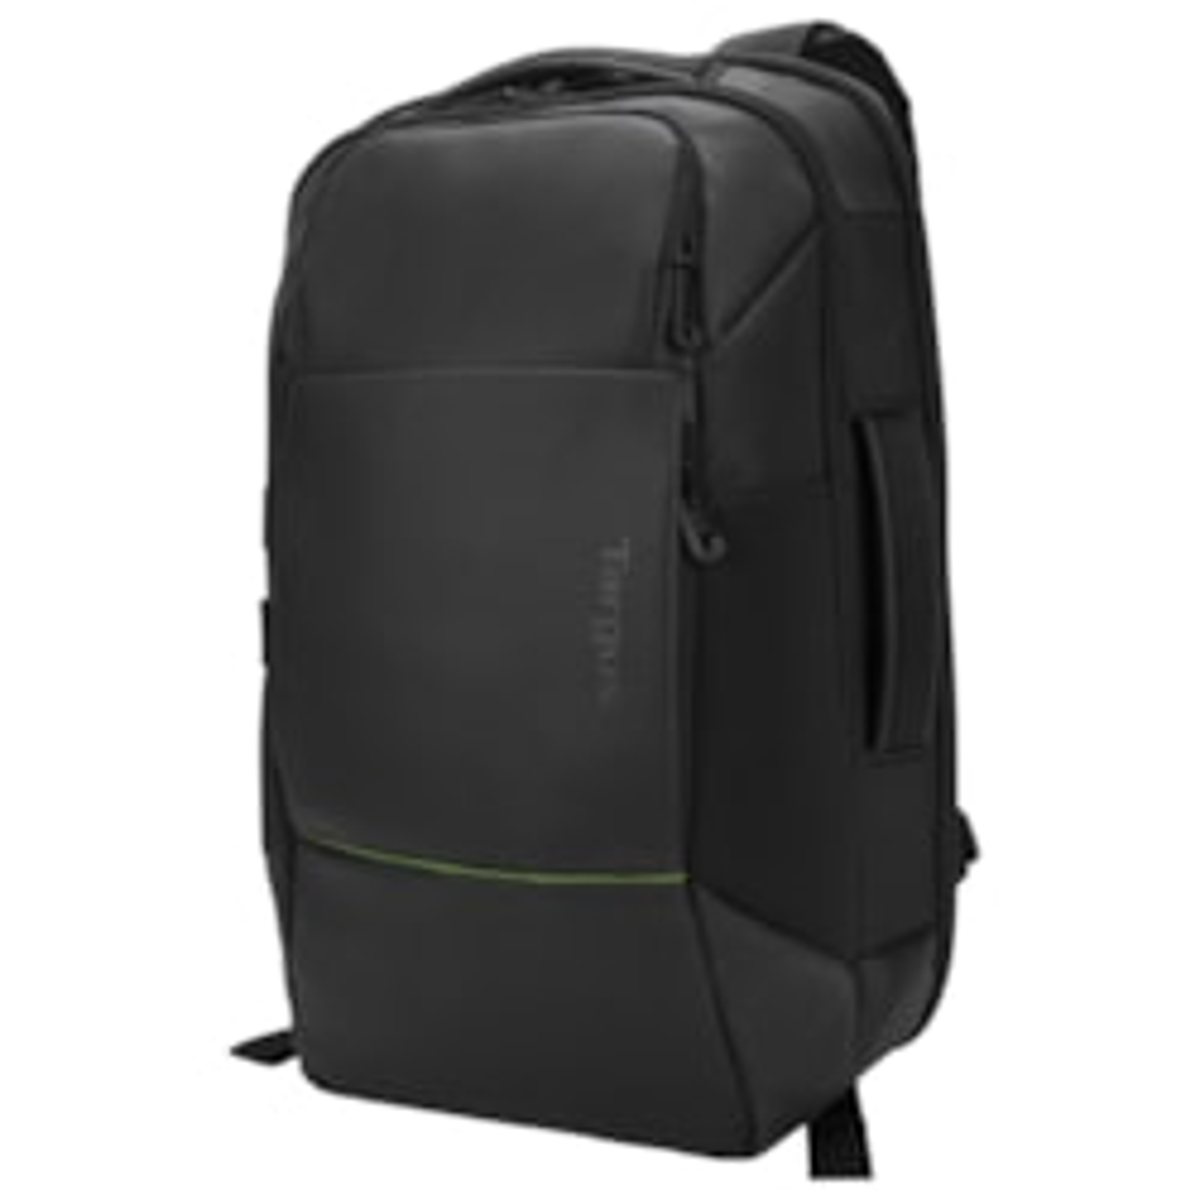 "Targus Balance TSB940AU Carrying Case (Backpack) for 35.6 cm (14"") Notebook - Black"